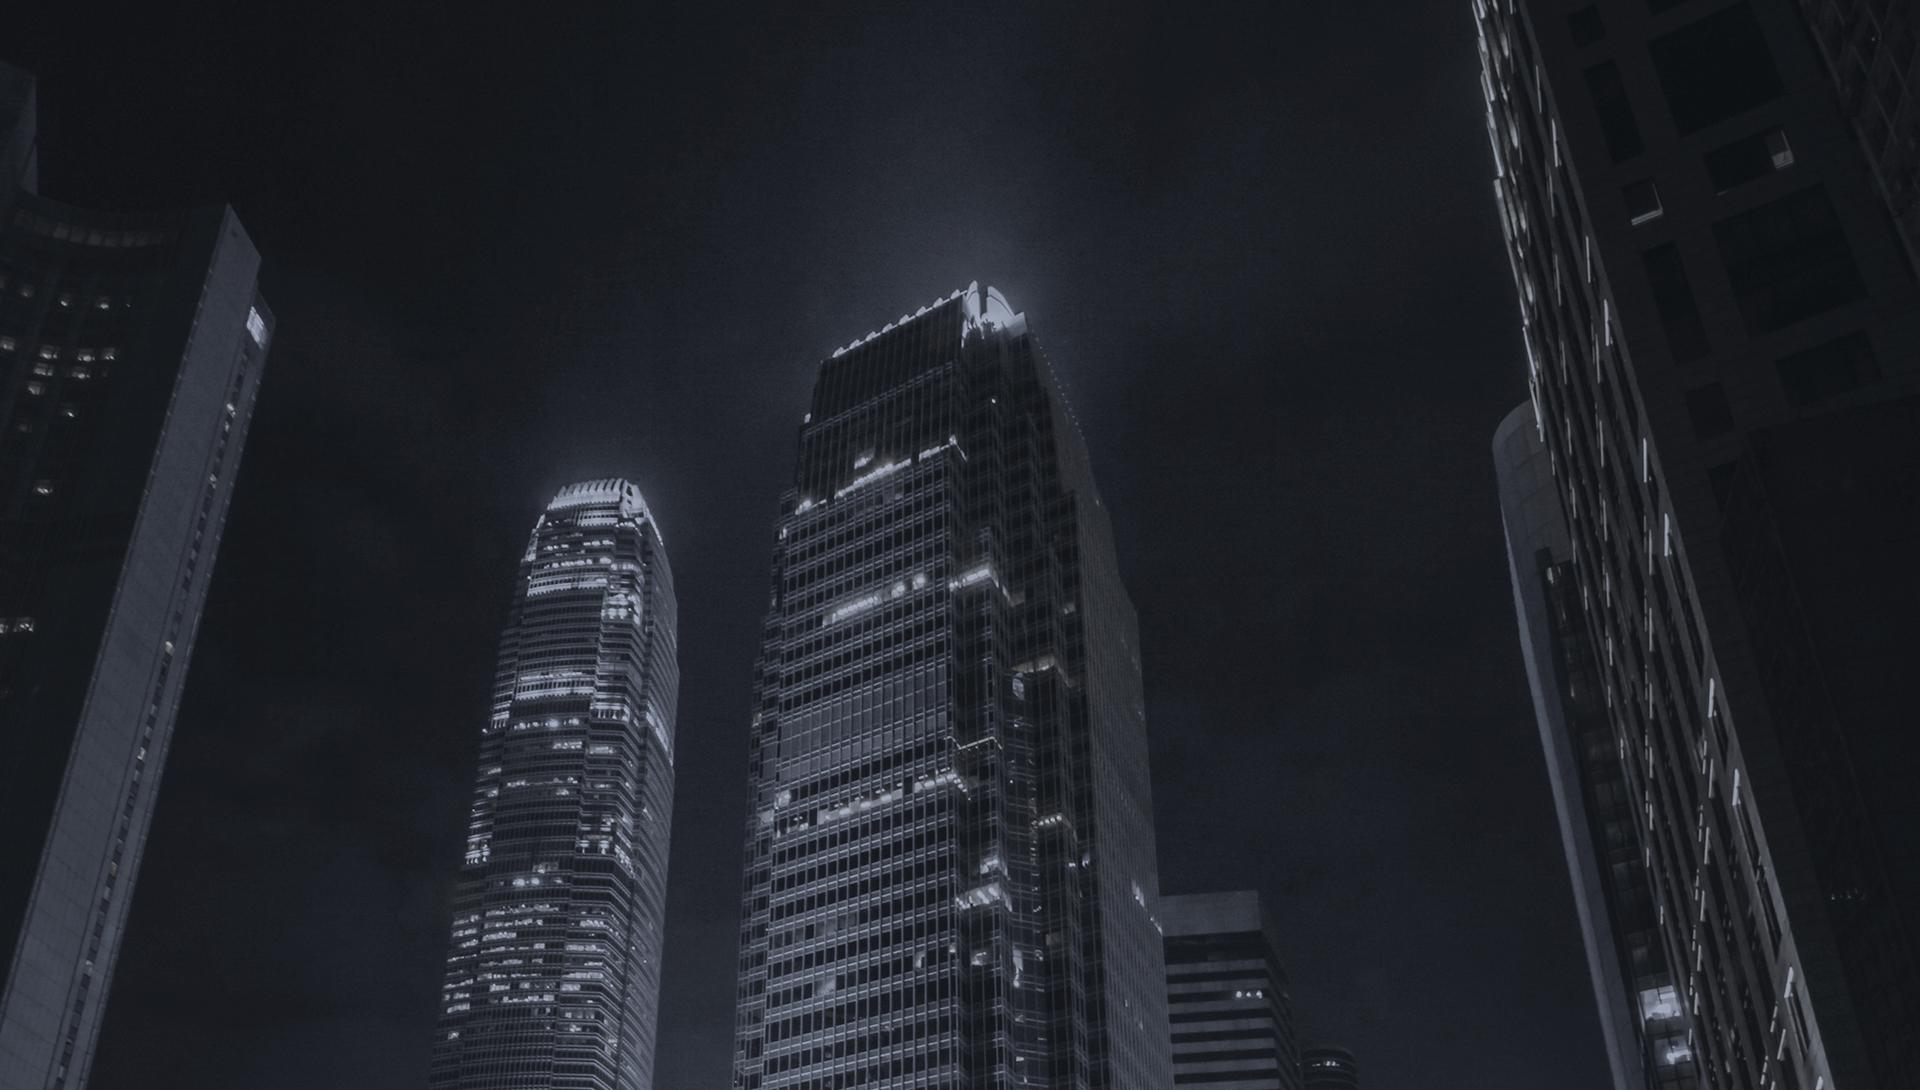 Hong Kong Blockchain Society 香港區塊鏈學會 HKBCS 港鏈會